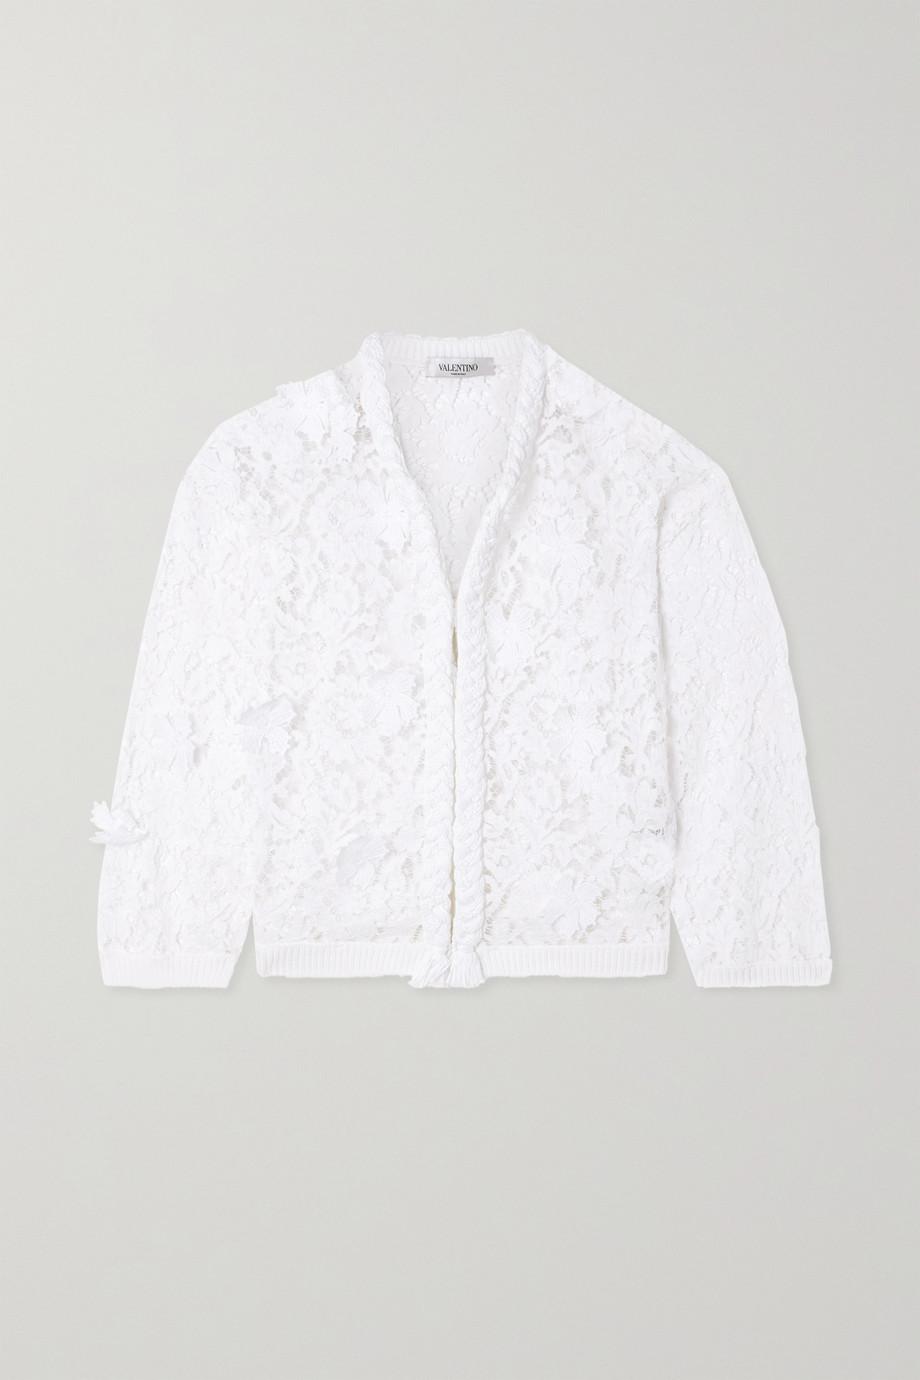 Valentino Appliquéd corded lace jacket